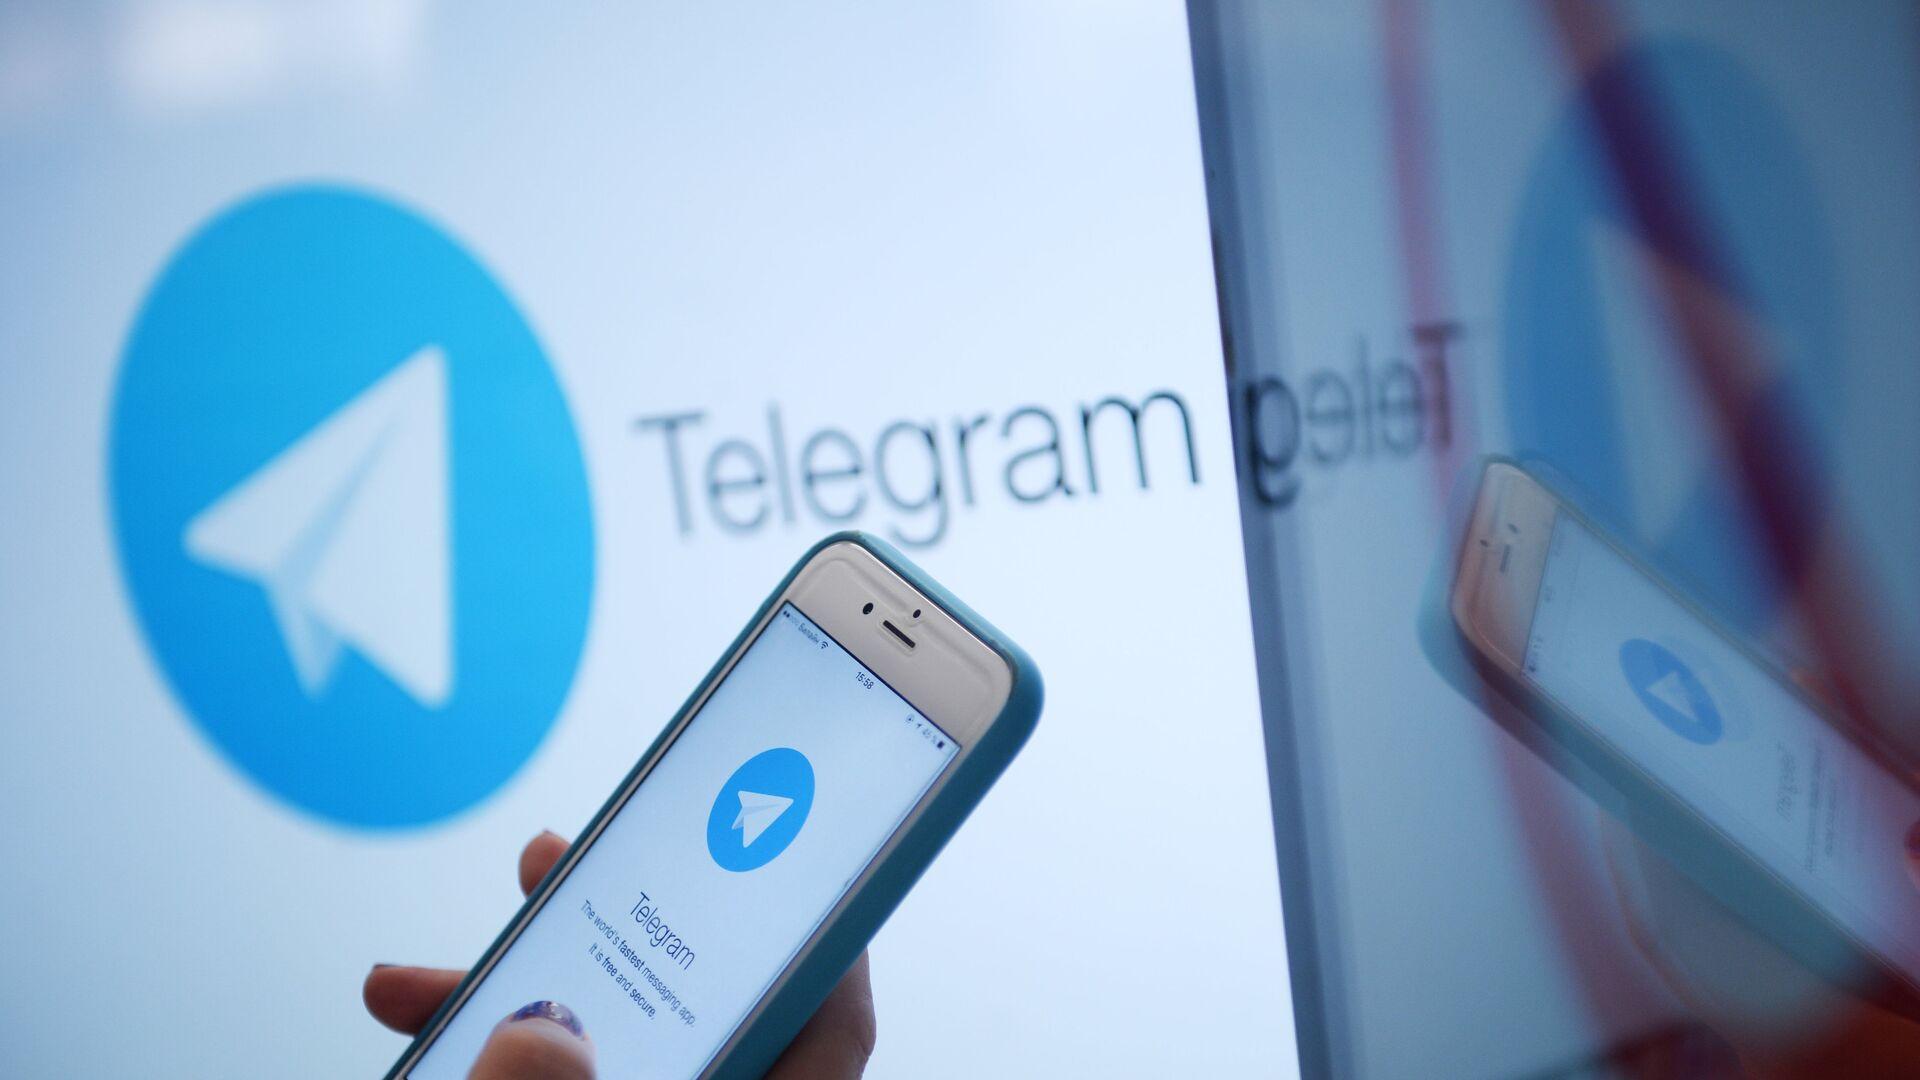 Логотип мессенджера Telegram на экране монитора и телефона - РИА Новости, 1920, 09.01.2021